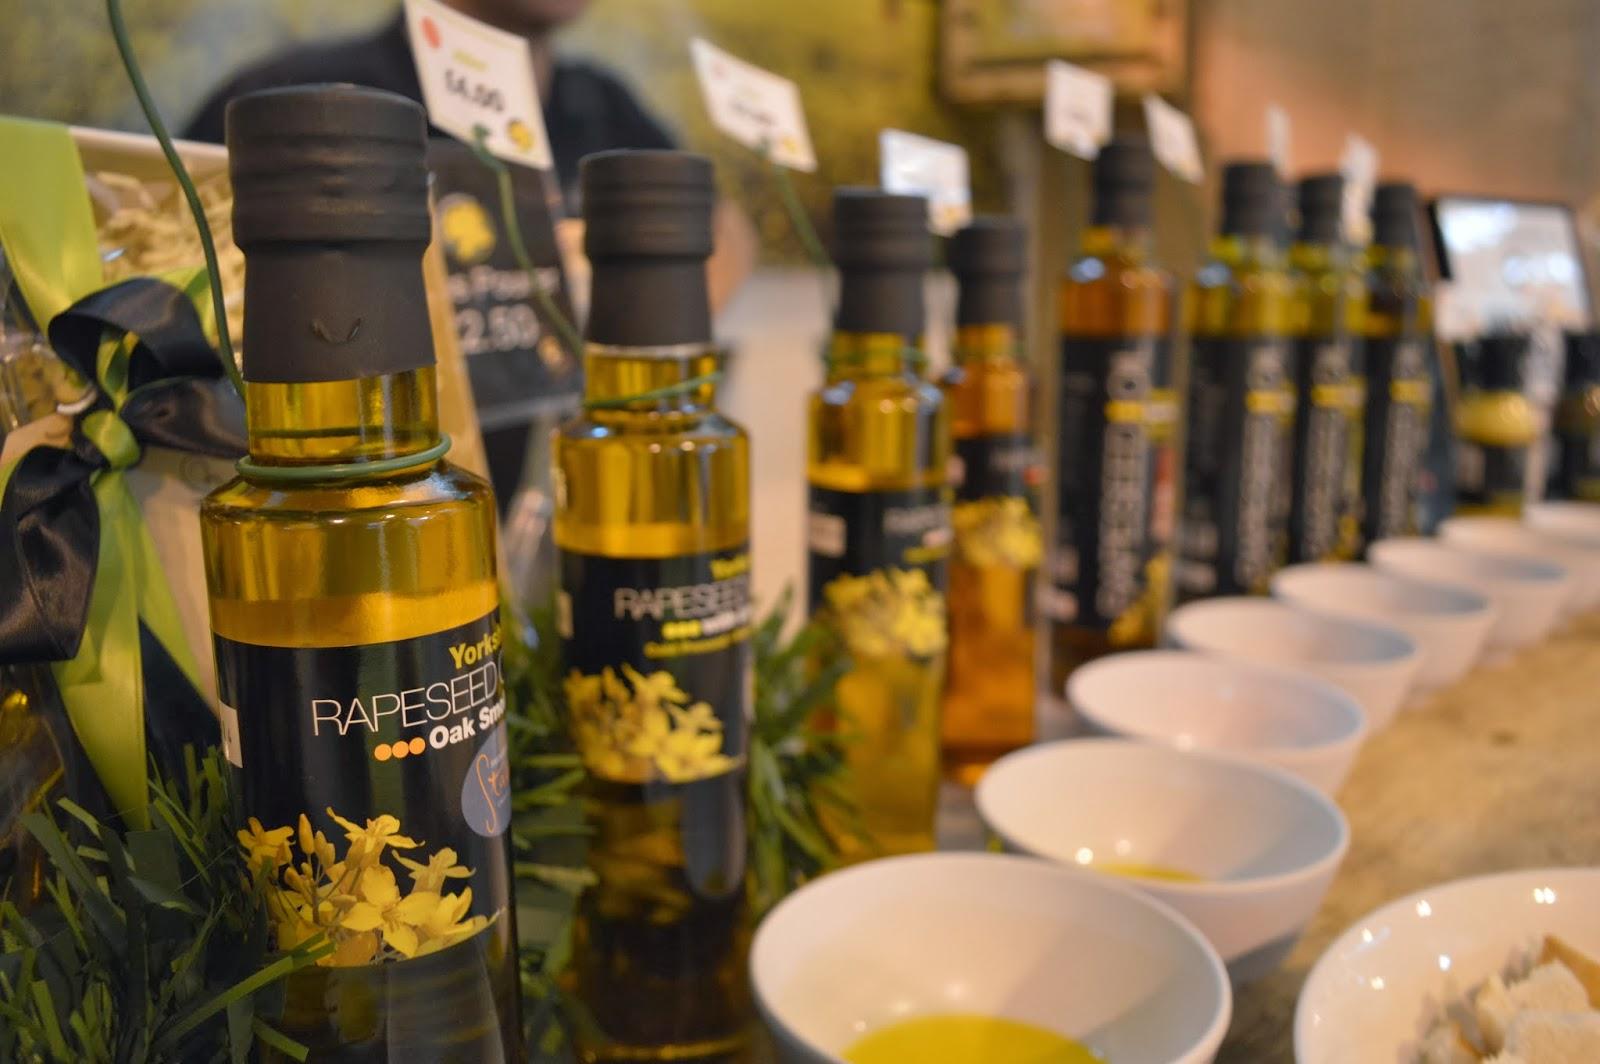 Yorkshire Rape Seed Oil